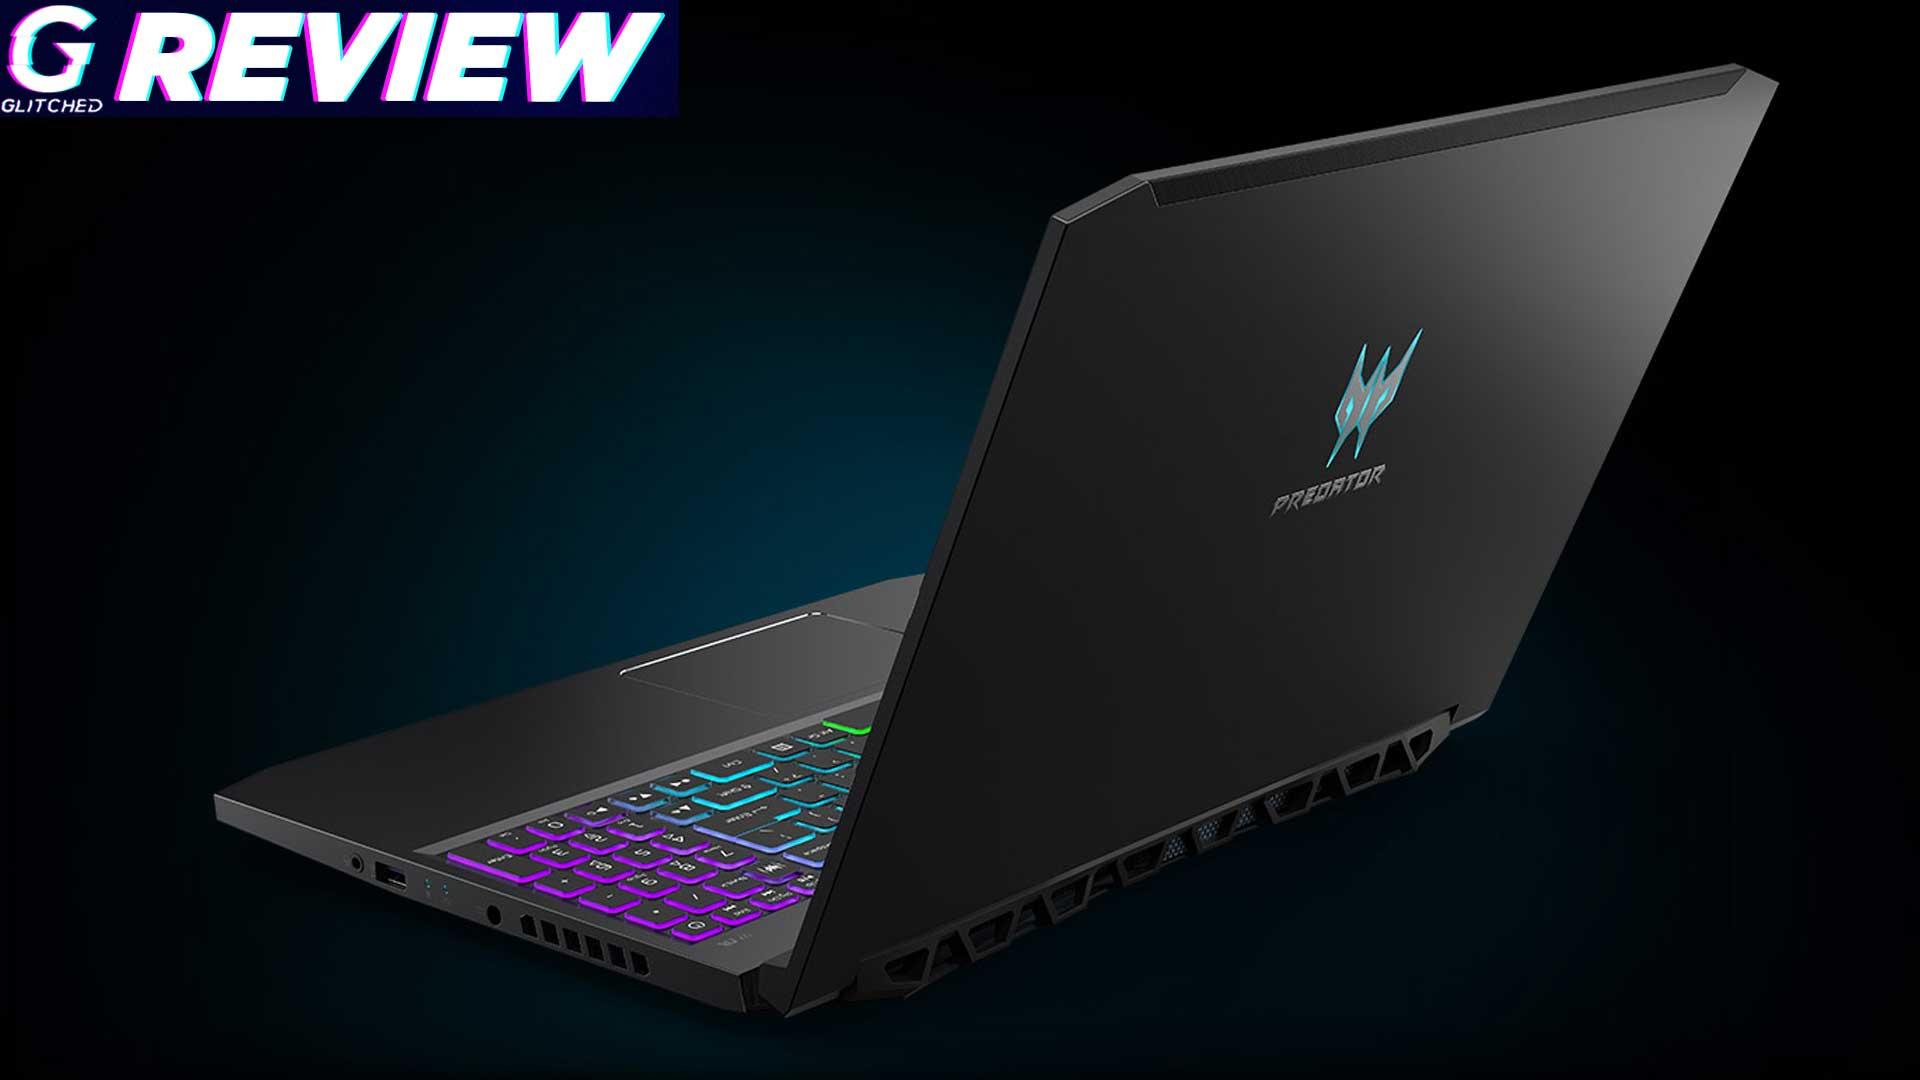 Acer Predator Triton 300 Gaming Notebook Review